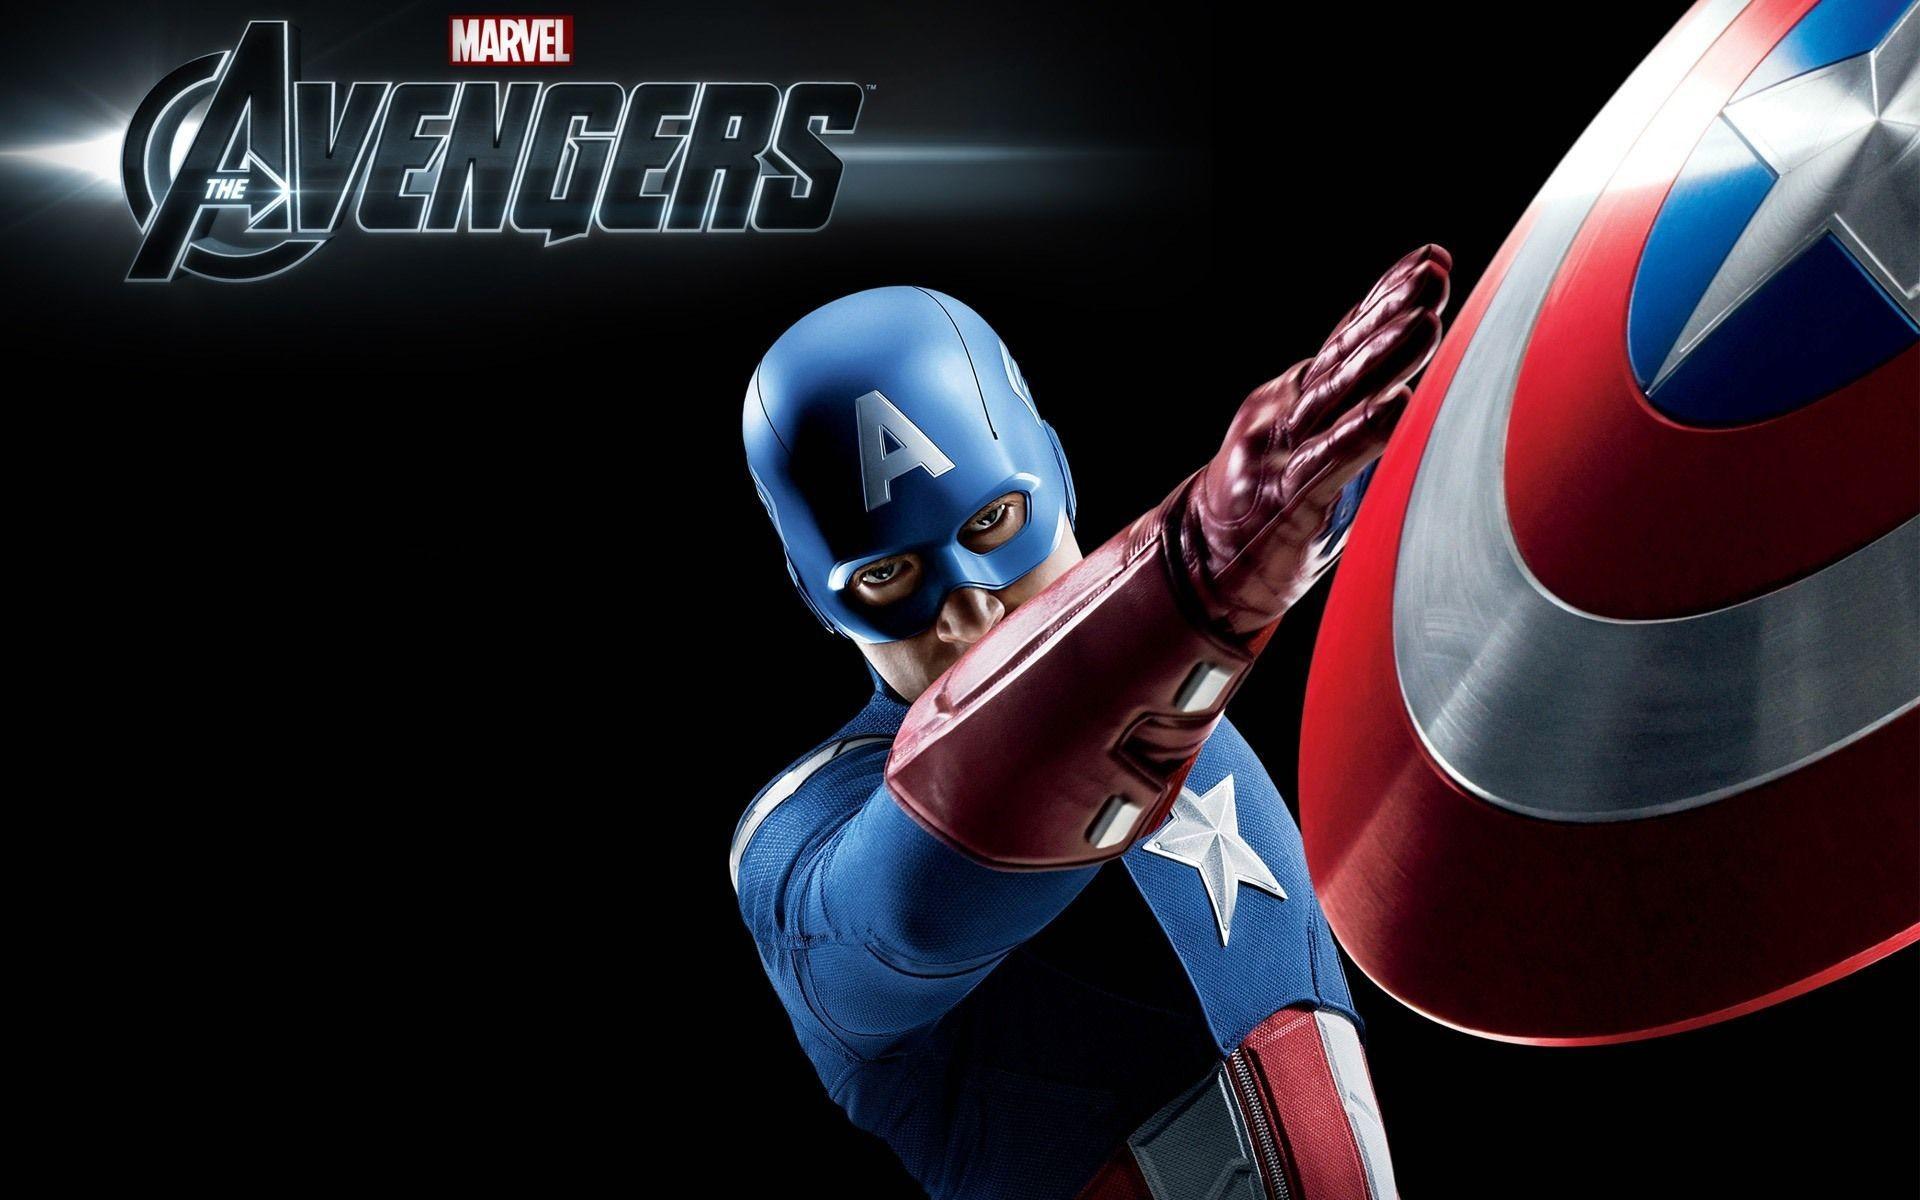 Chris Hemsworth Thor Avengers Wallpapers HD Wallpapers 1920×1200 Avengers Hd  Wallpaper (43 Wallpapers